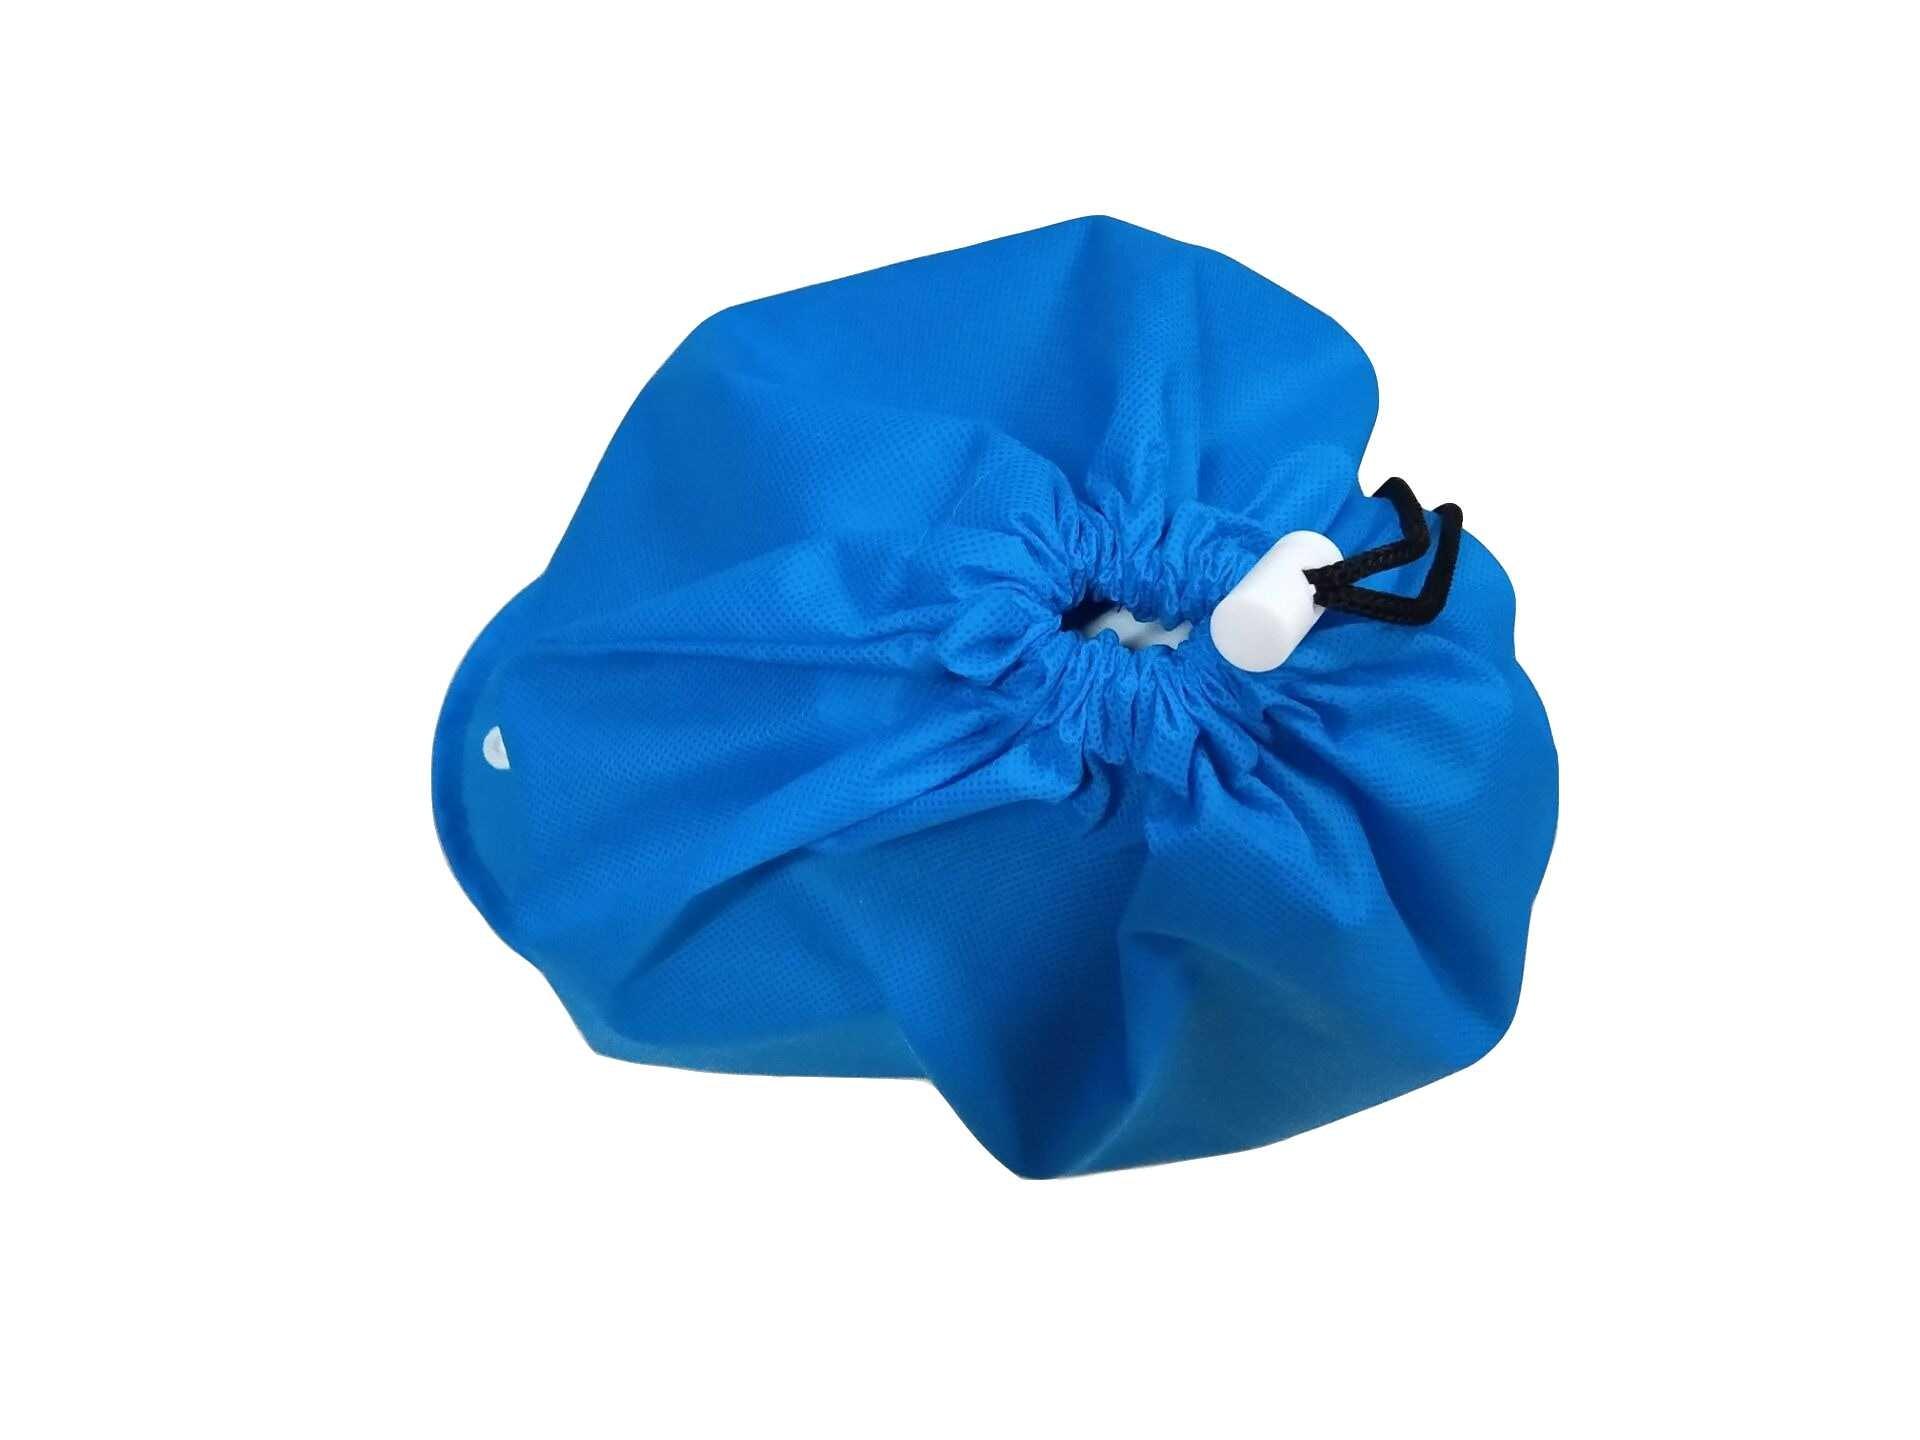 Wholesale Logo Customized Foldable Non Woven Bag Tote Shopping Bag, Logo Customized Foldable Non Woven Bag Tote Shopping Bag Manufacturers, Logo Customized Foldable Non Woven Bag Tote Shopping Bag Producers